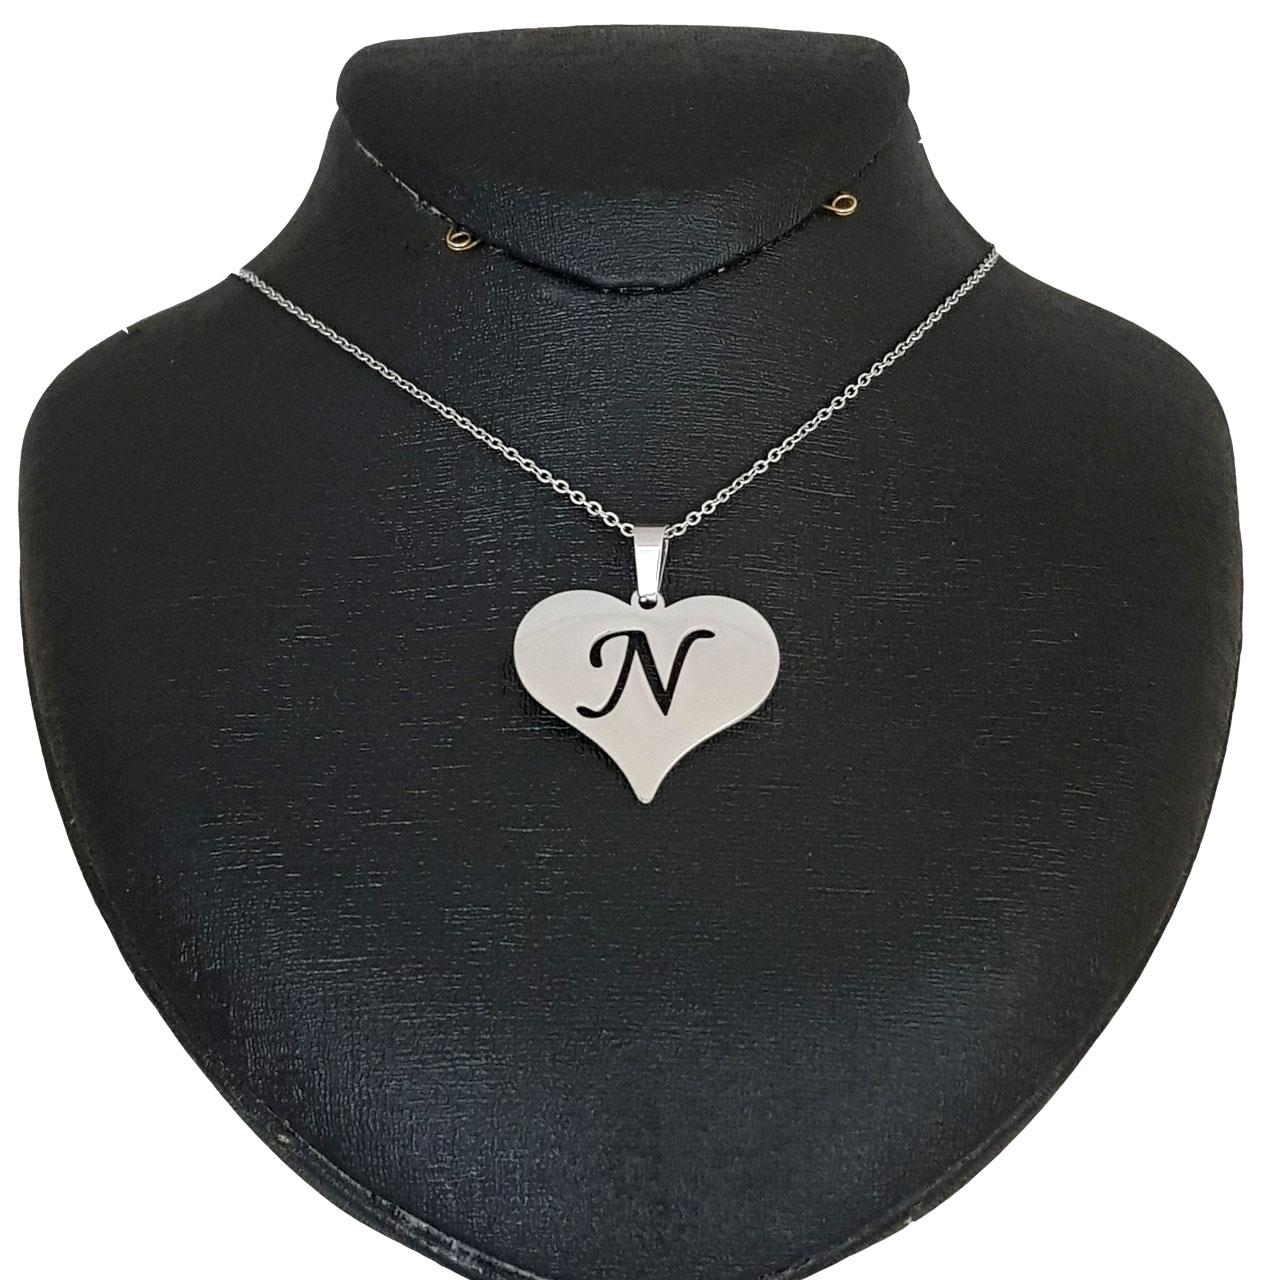 گردنبند نقره مدل قلب حرف N کد AC34